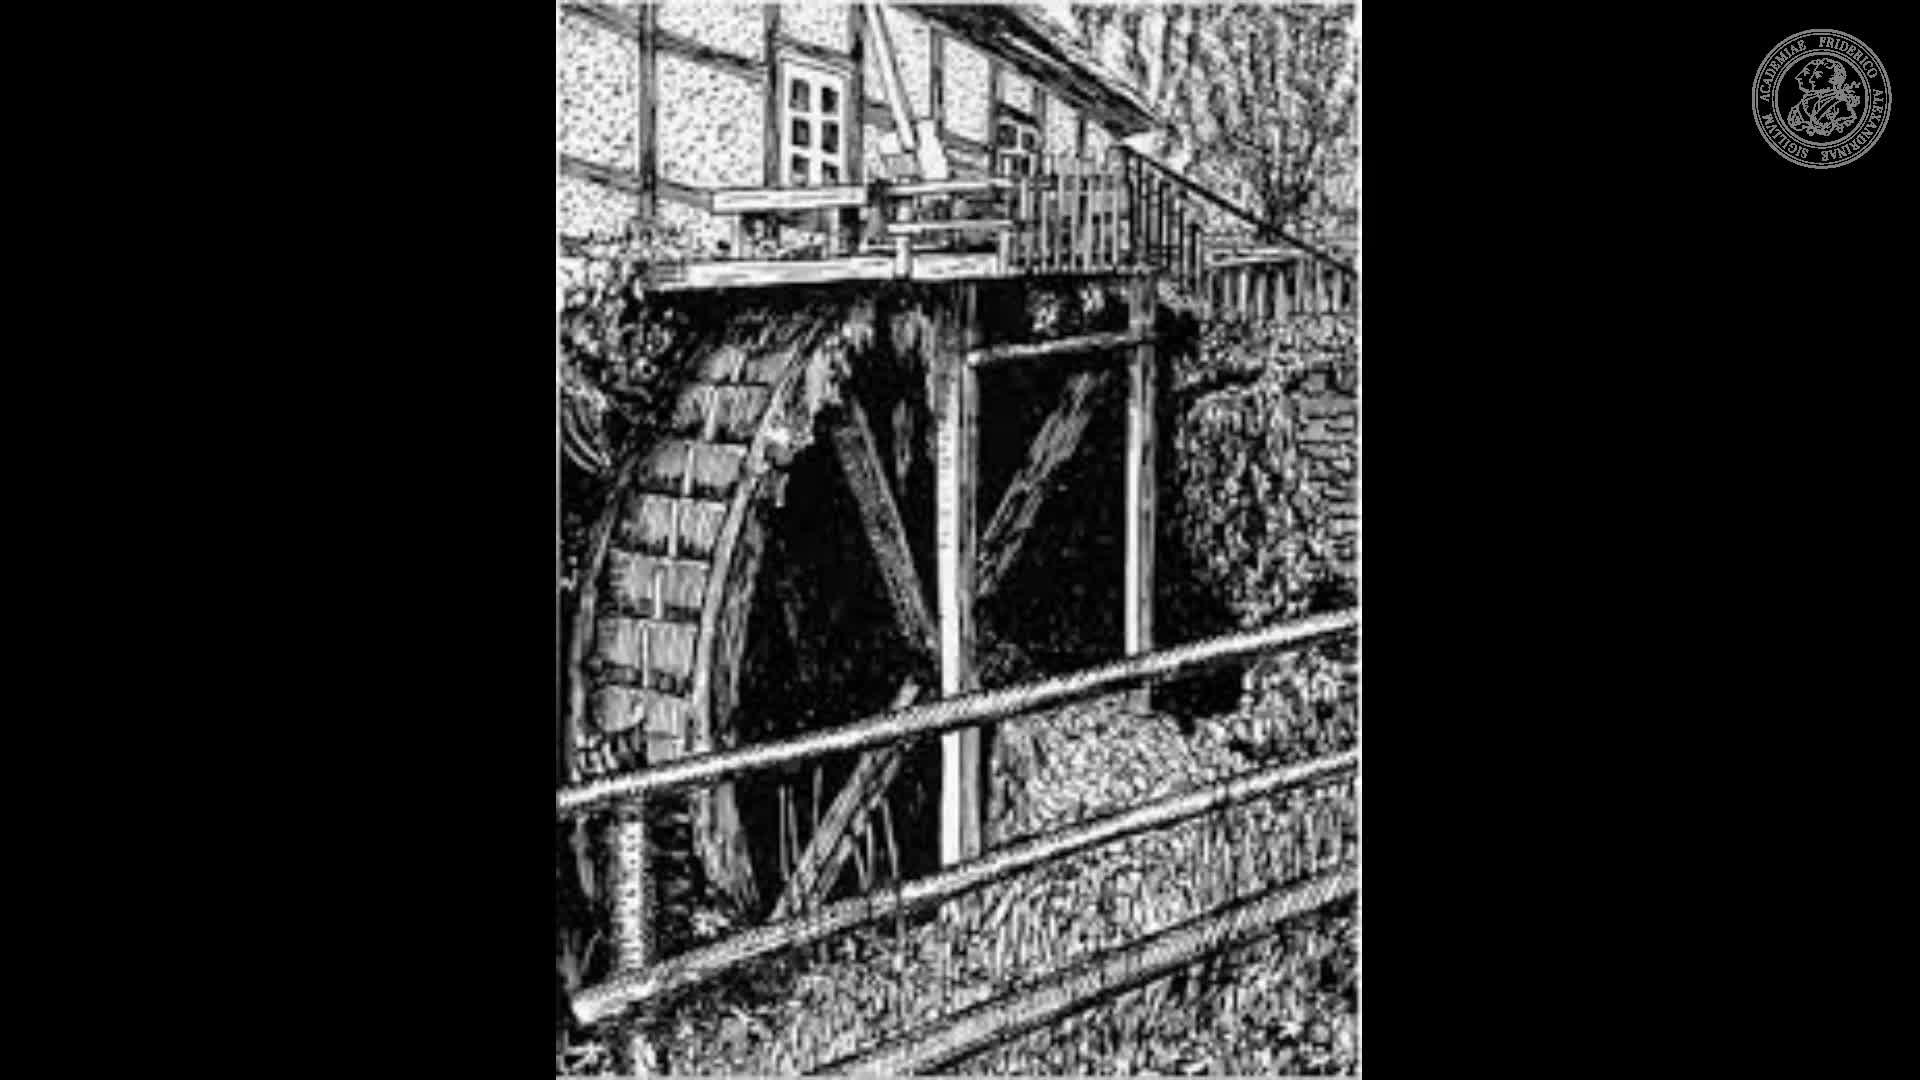 Papiermühle preview image